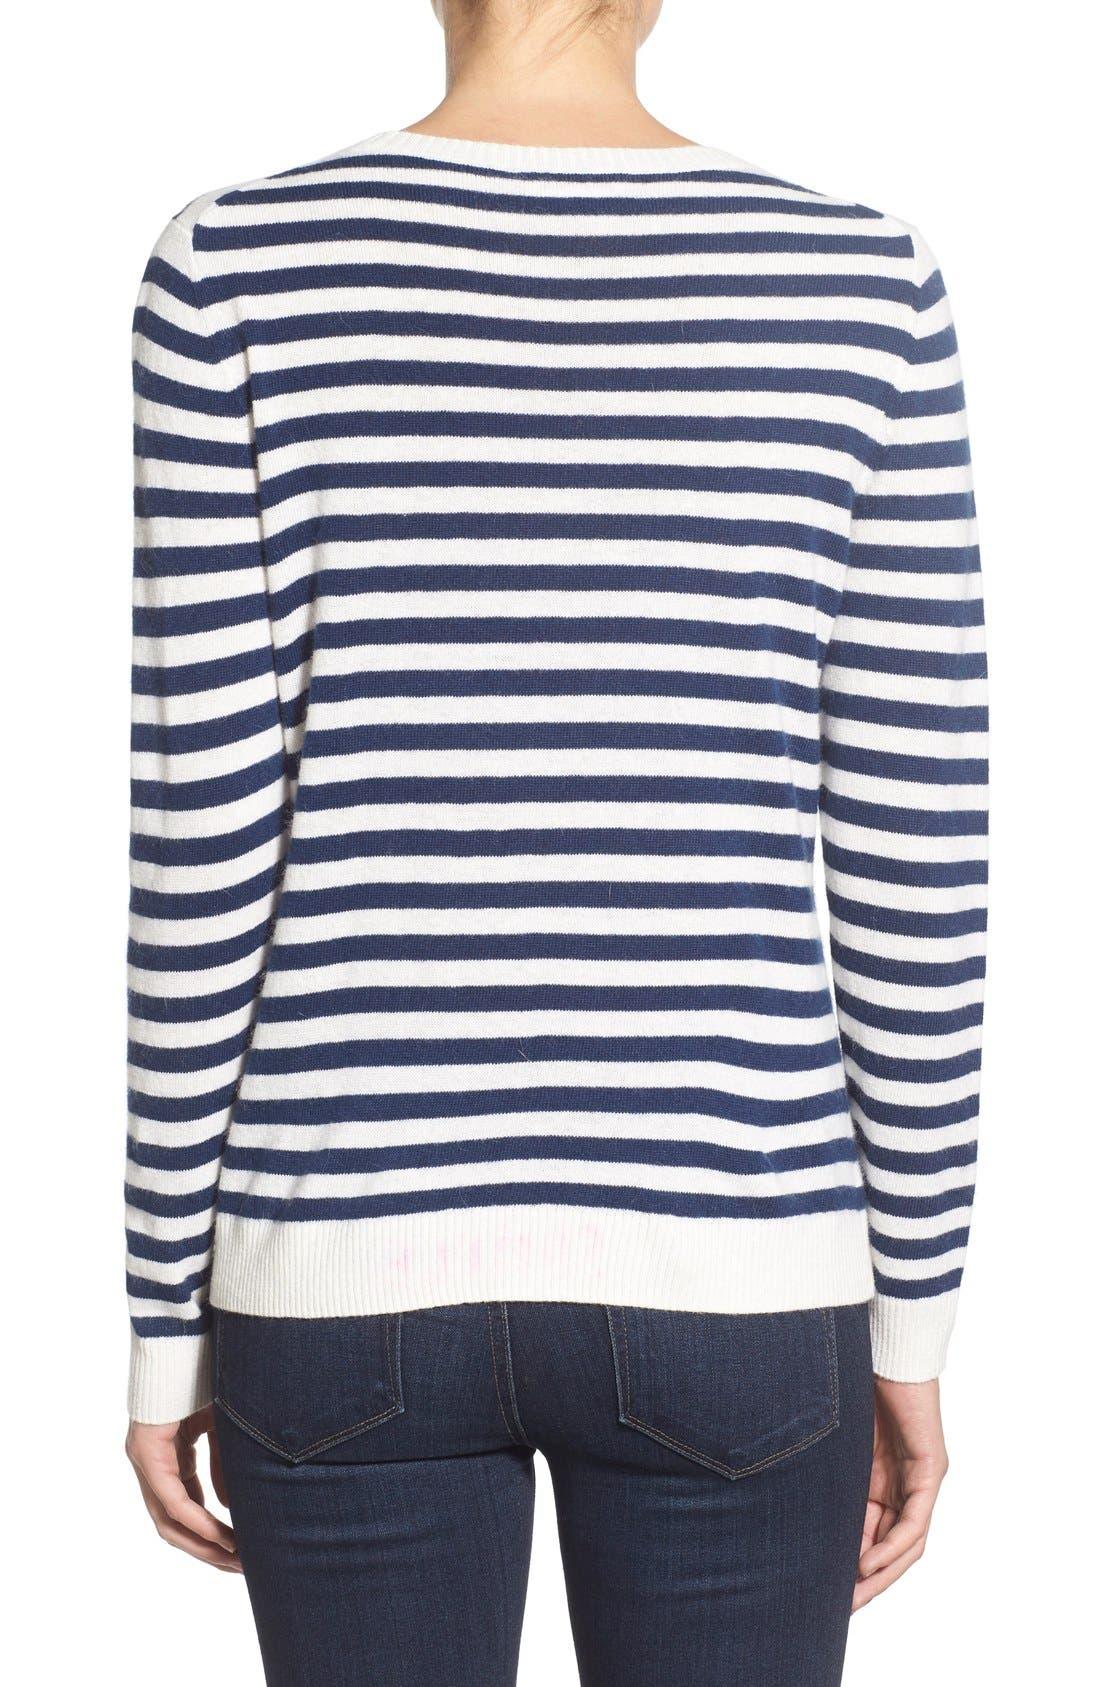 Alternate Image 2  - Vineyard Vines 'Nautical Stripe Whale' Crewneck Sweater